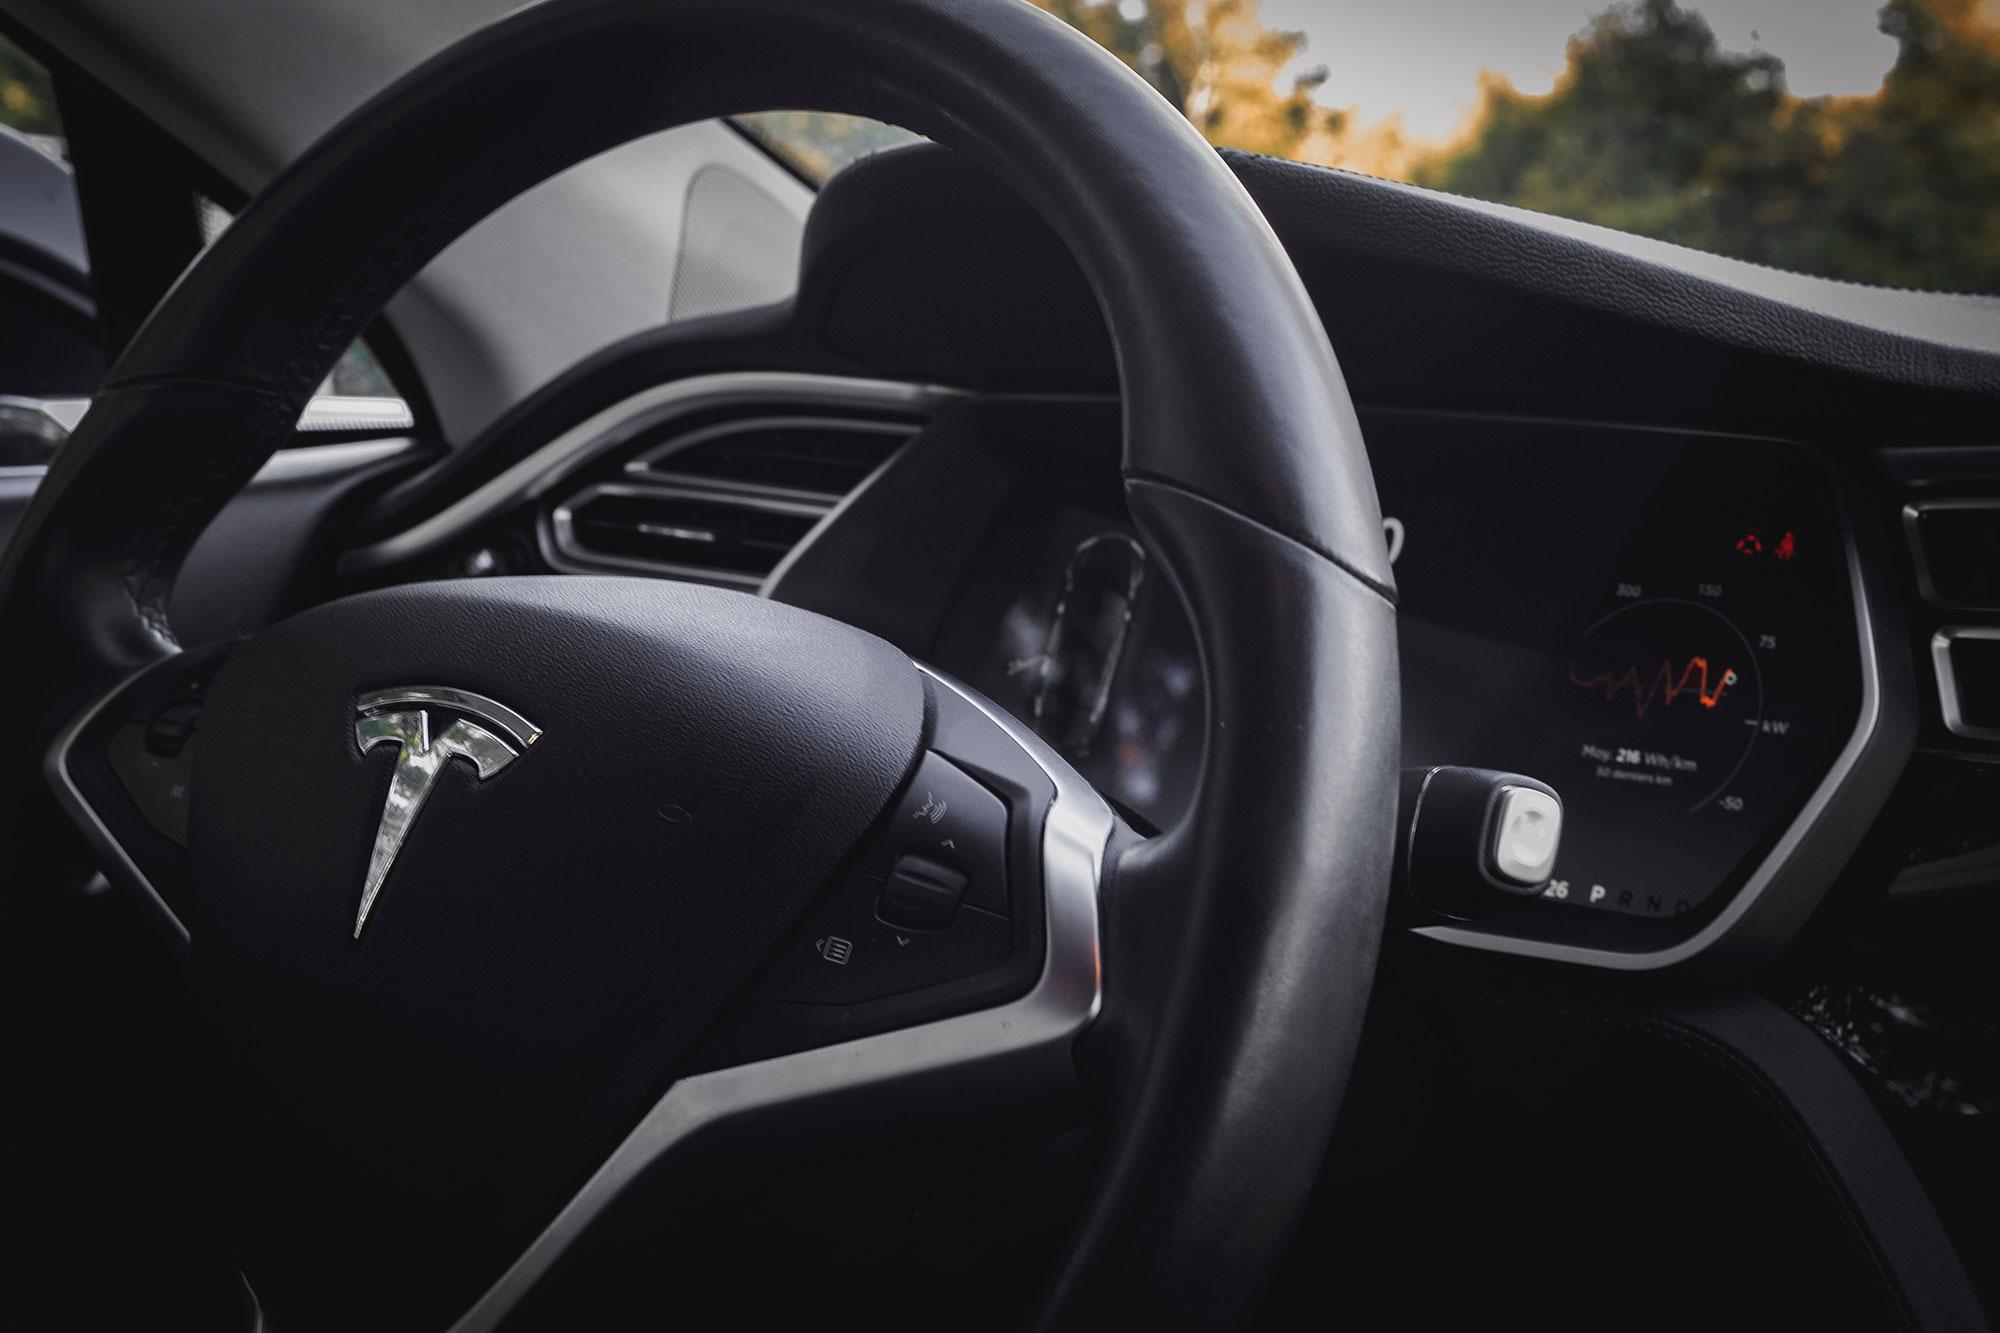 Schwarzenegger-Backed Battery Startup Ratchets Up Tesla Fight